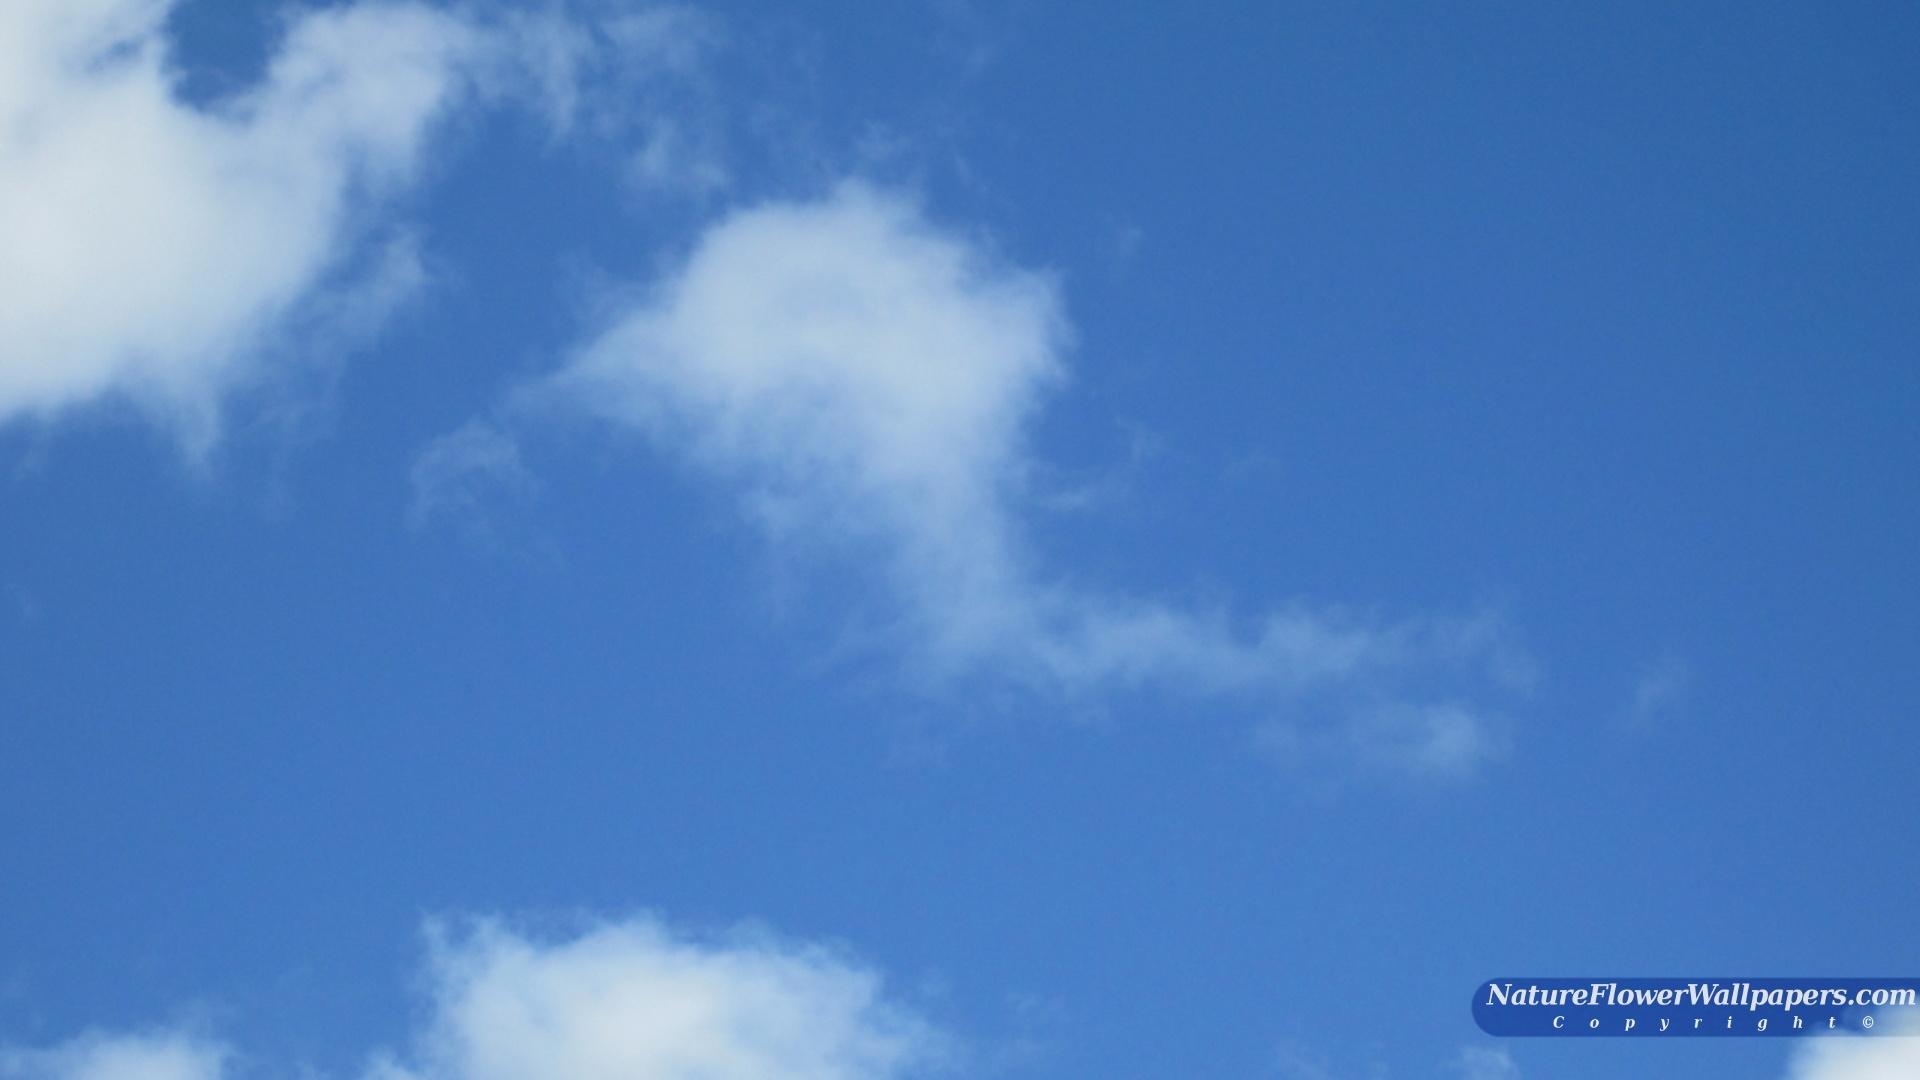 Blue sky wallpaper 1920x1080 resolution 1920x1080